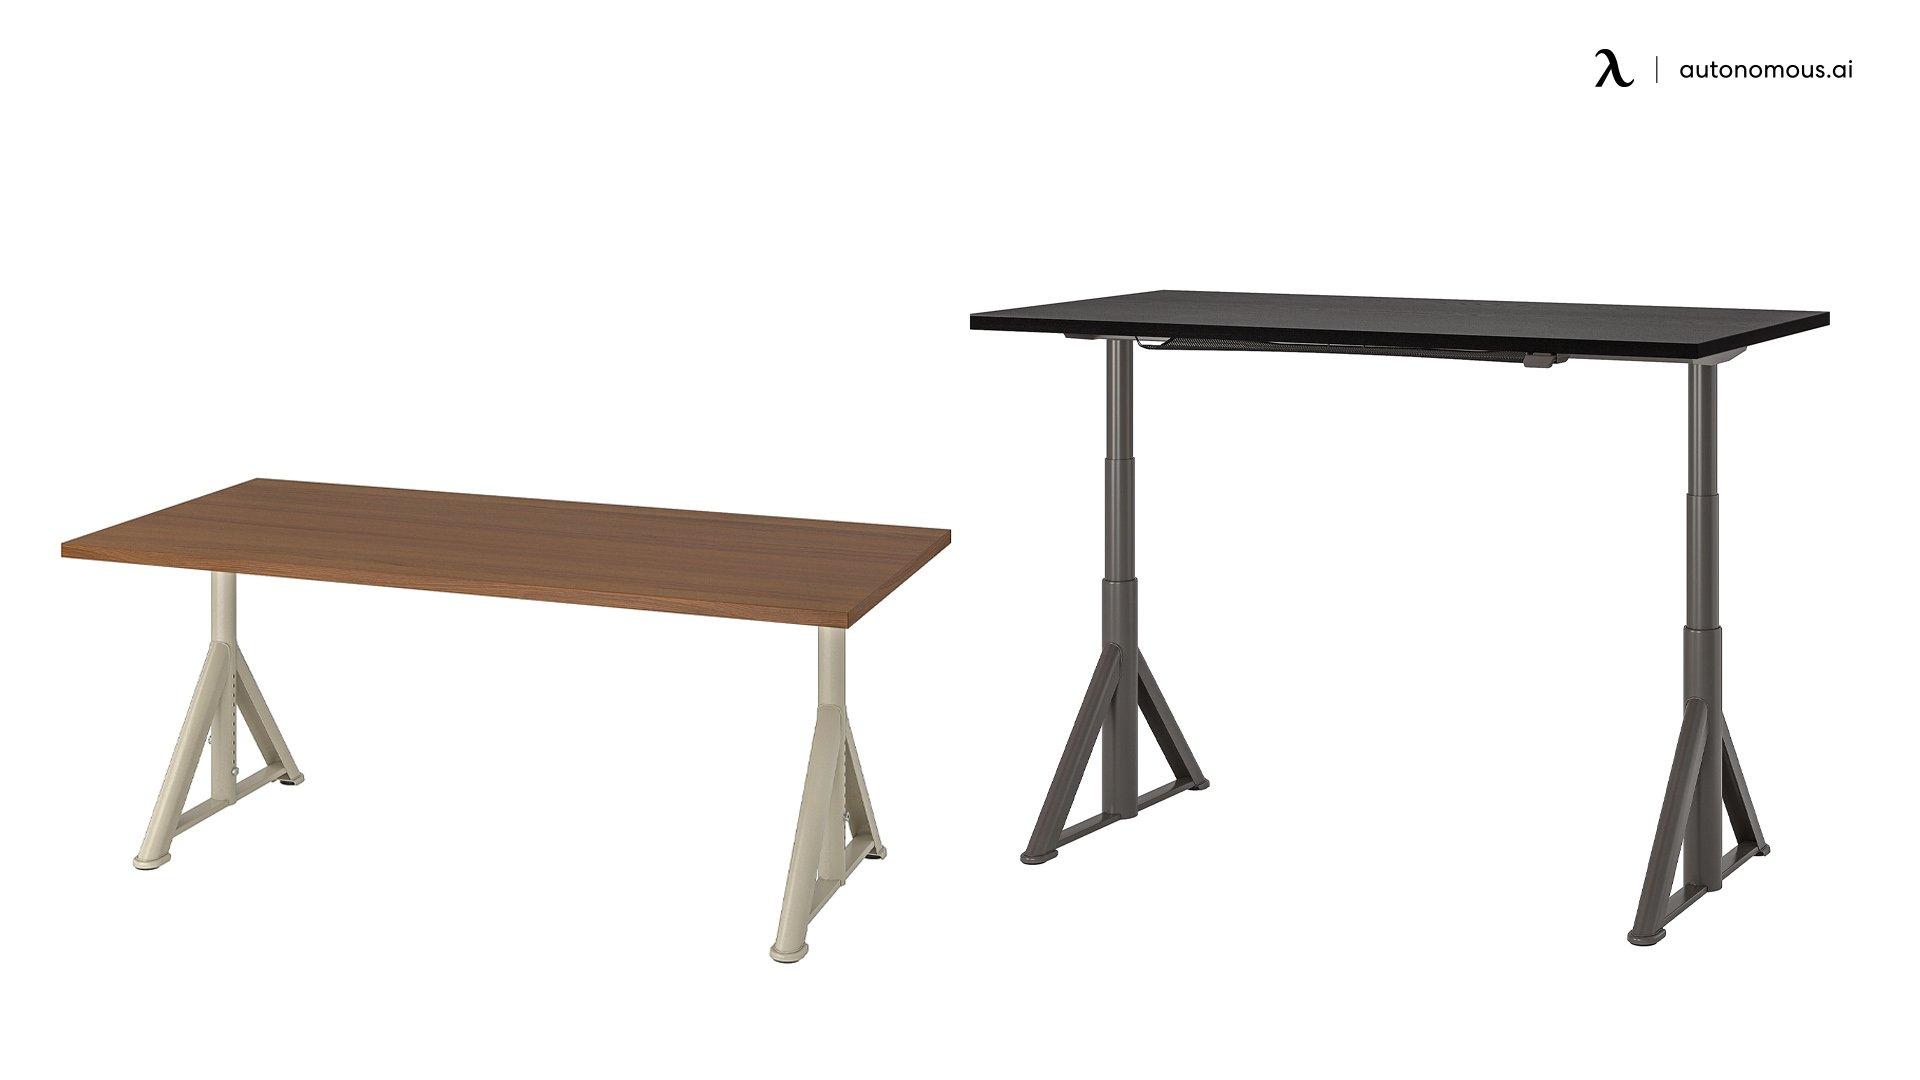 Ikea IDÅSEN Contemporary Standing Desk